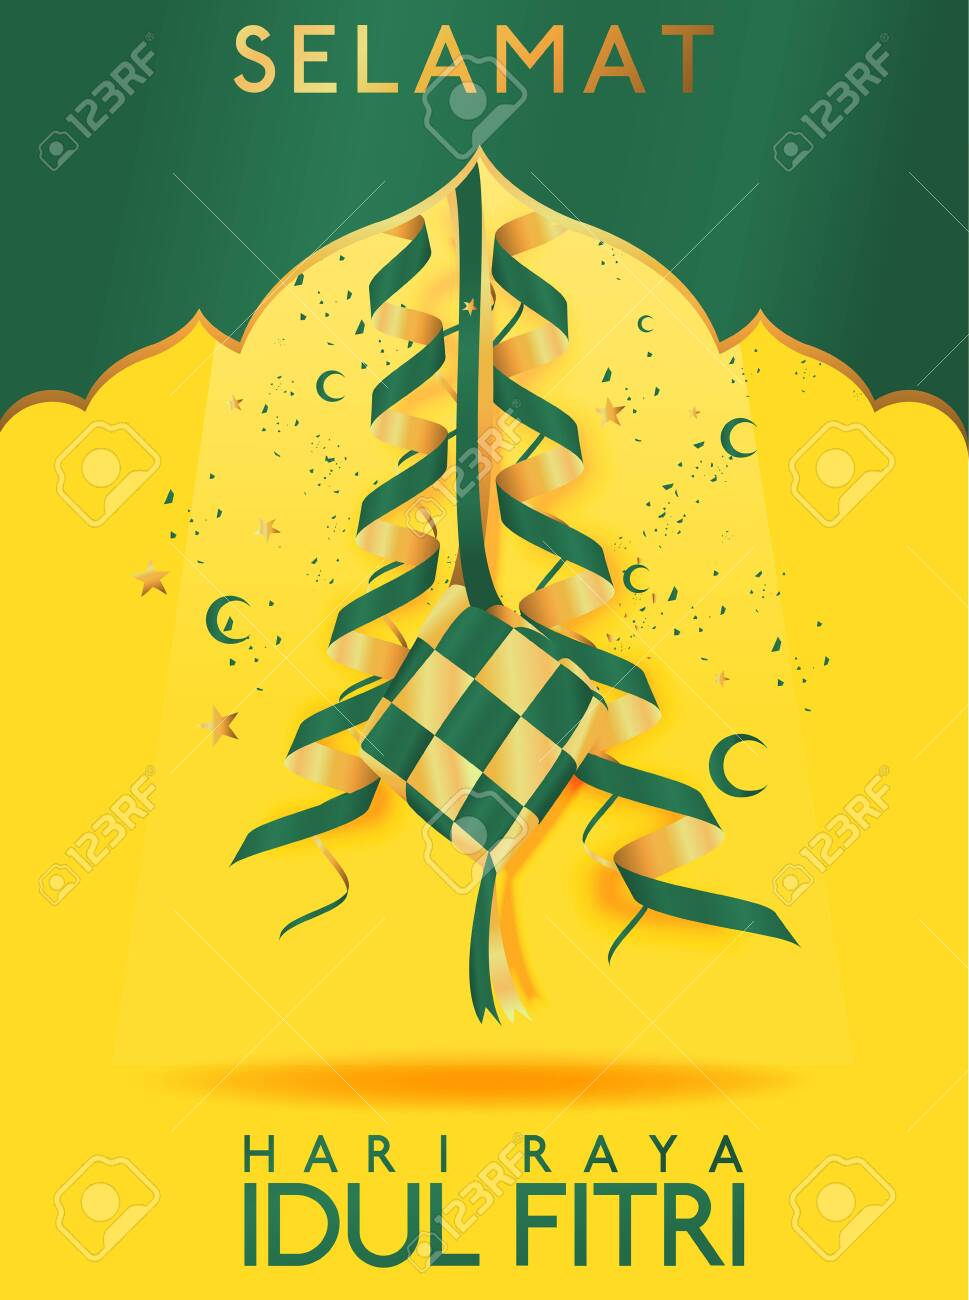 Selamat Idul Fitri Vector : selamat, fitri, vector, Ramadan, Kareem, Background, Pattern, Template.., Royalty, Cliparts,, Vectors,, Stock, Illustration., Image, 144308913.